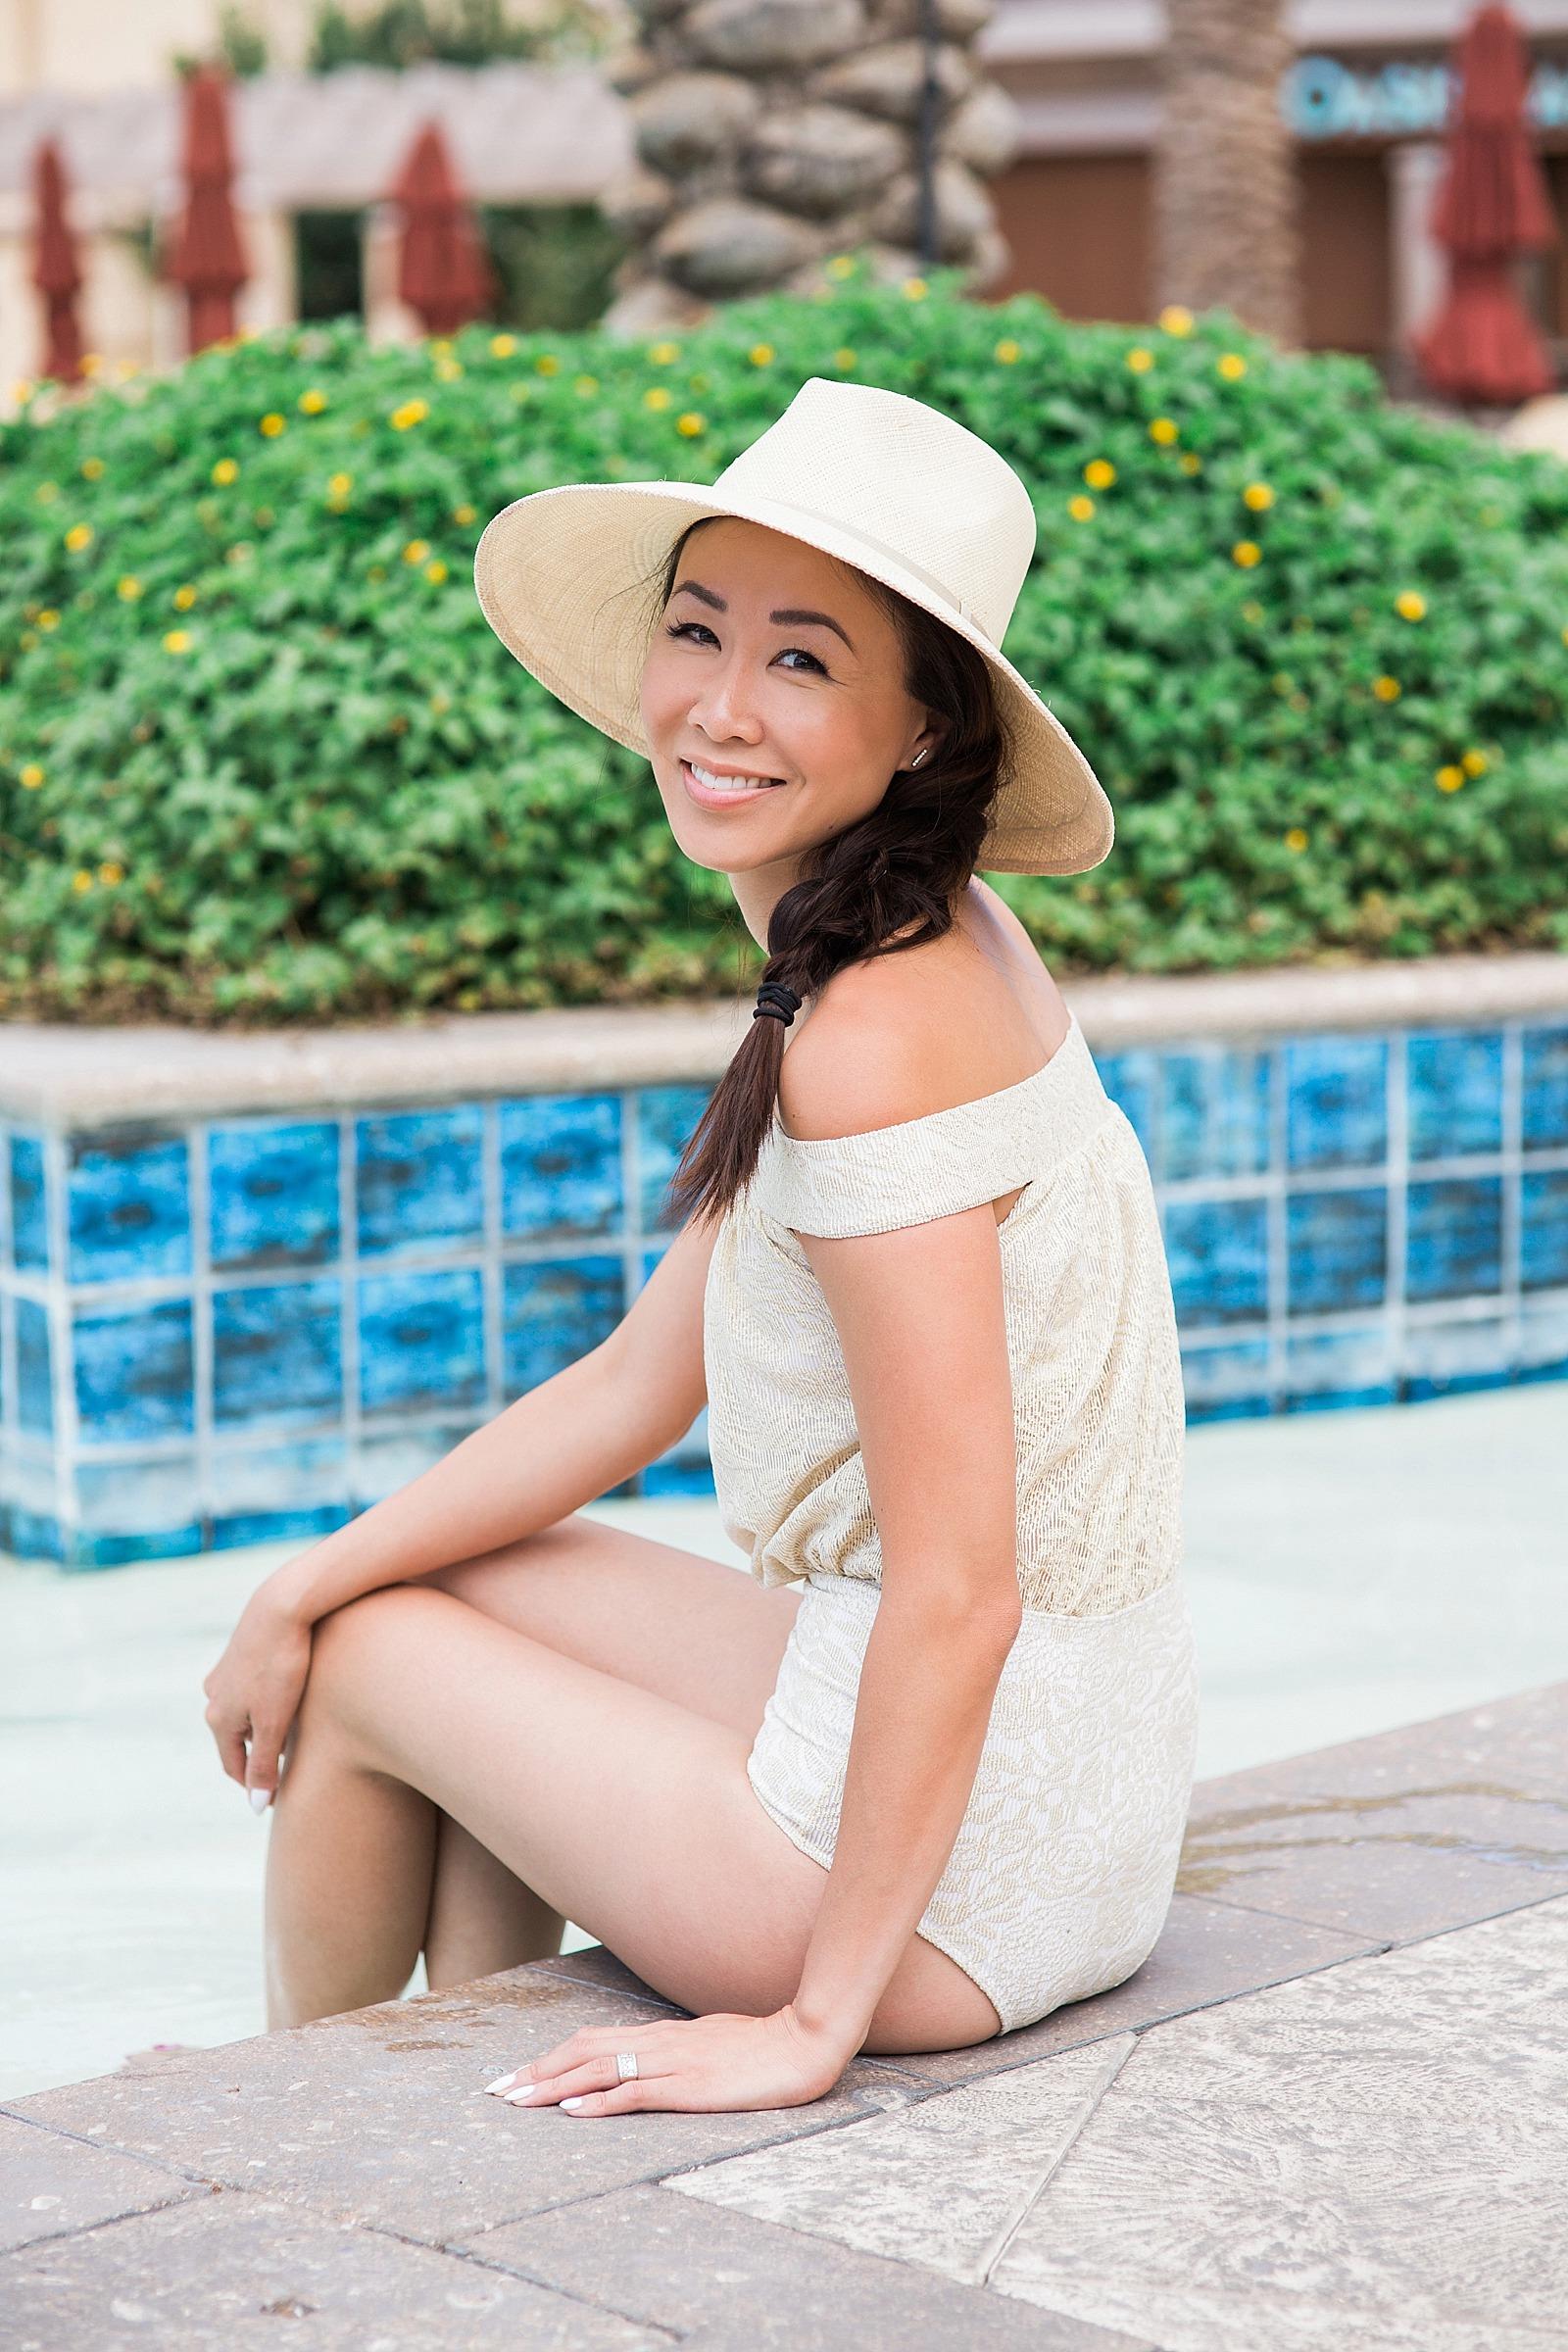 off-shoulder-bikini-riot-swimsuit-casino-del-sol-diana-elizabeth-blog-lifestyle-blogger-style_0041